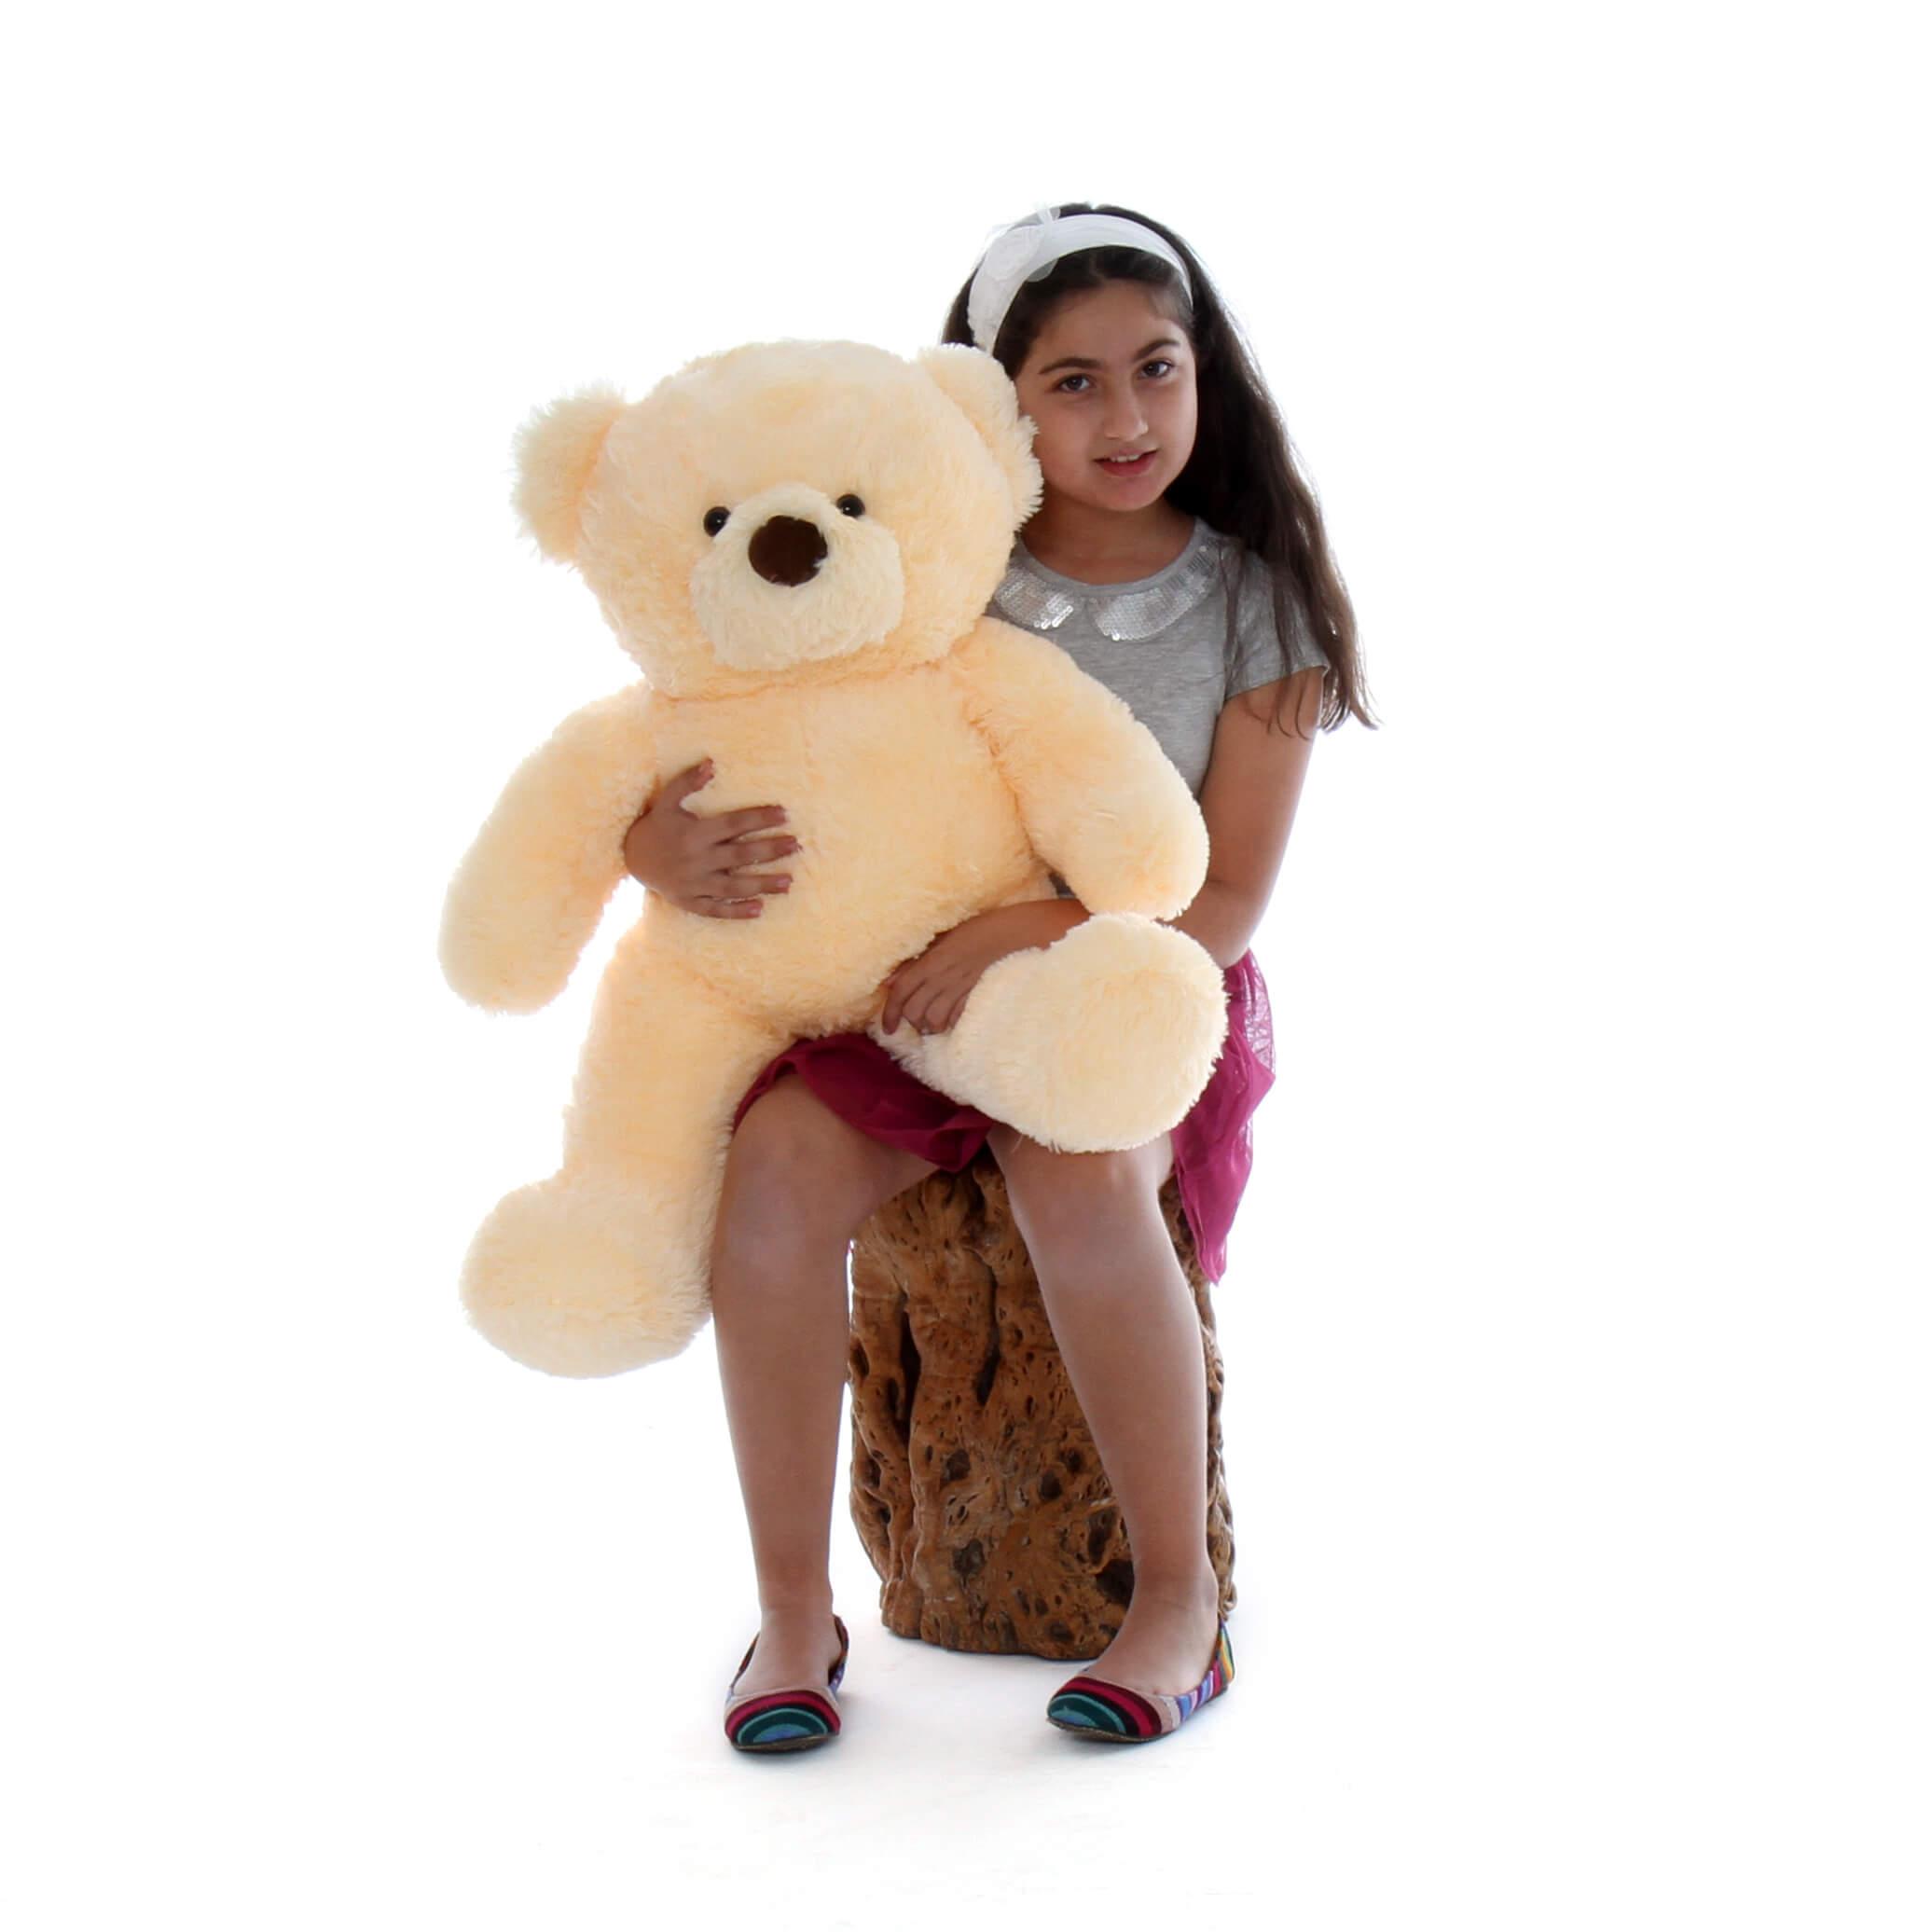 giant-teddy-bear-in-vanilla-smiley-chubs-1.jpg